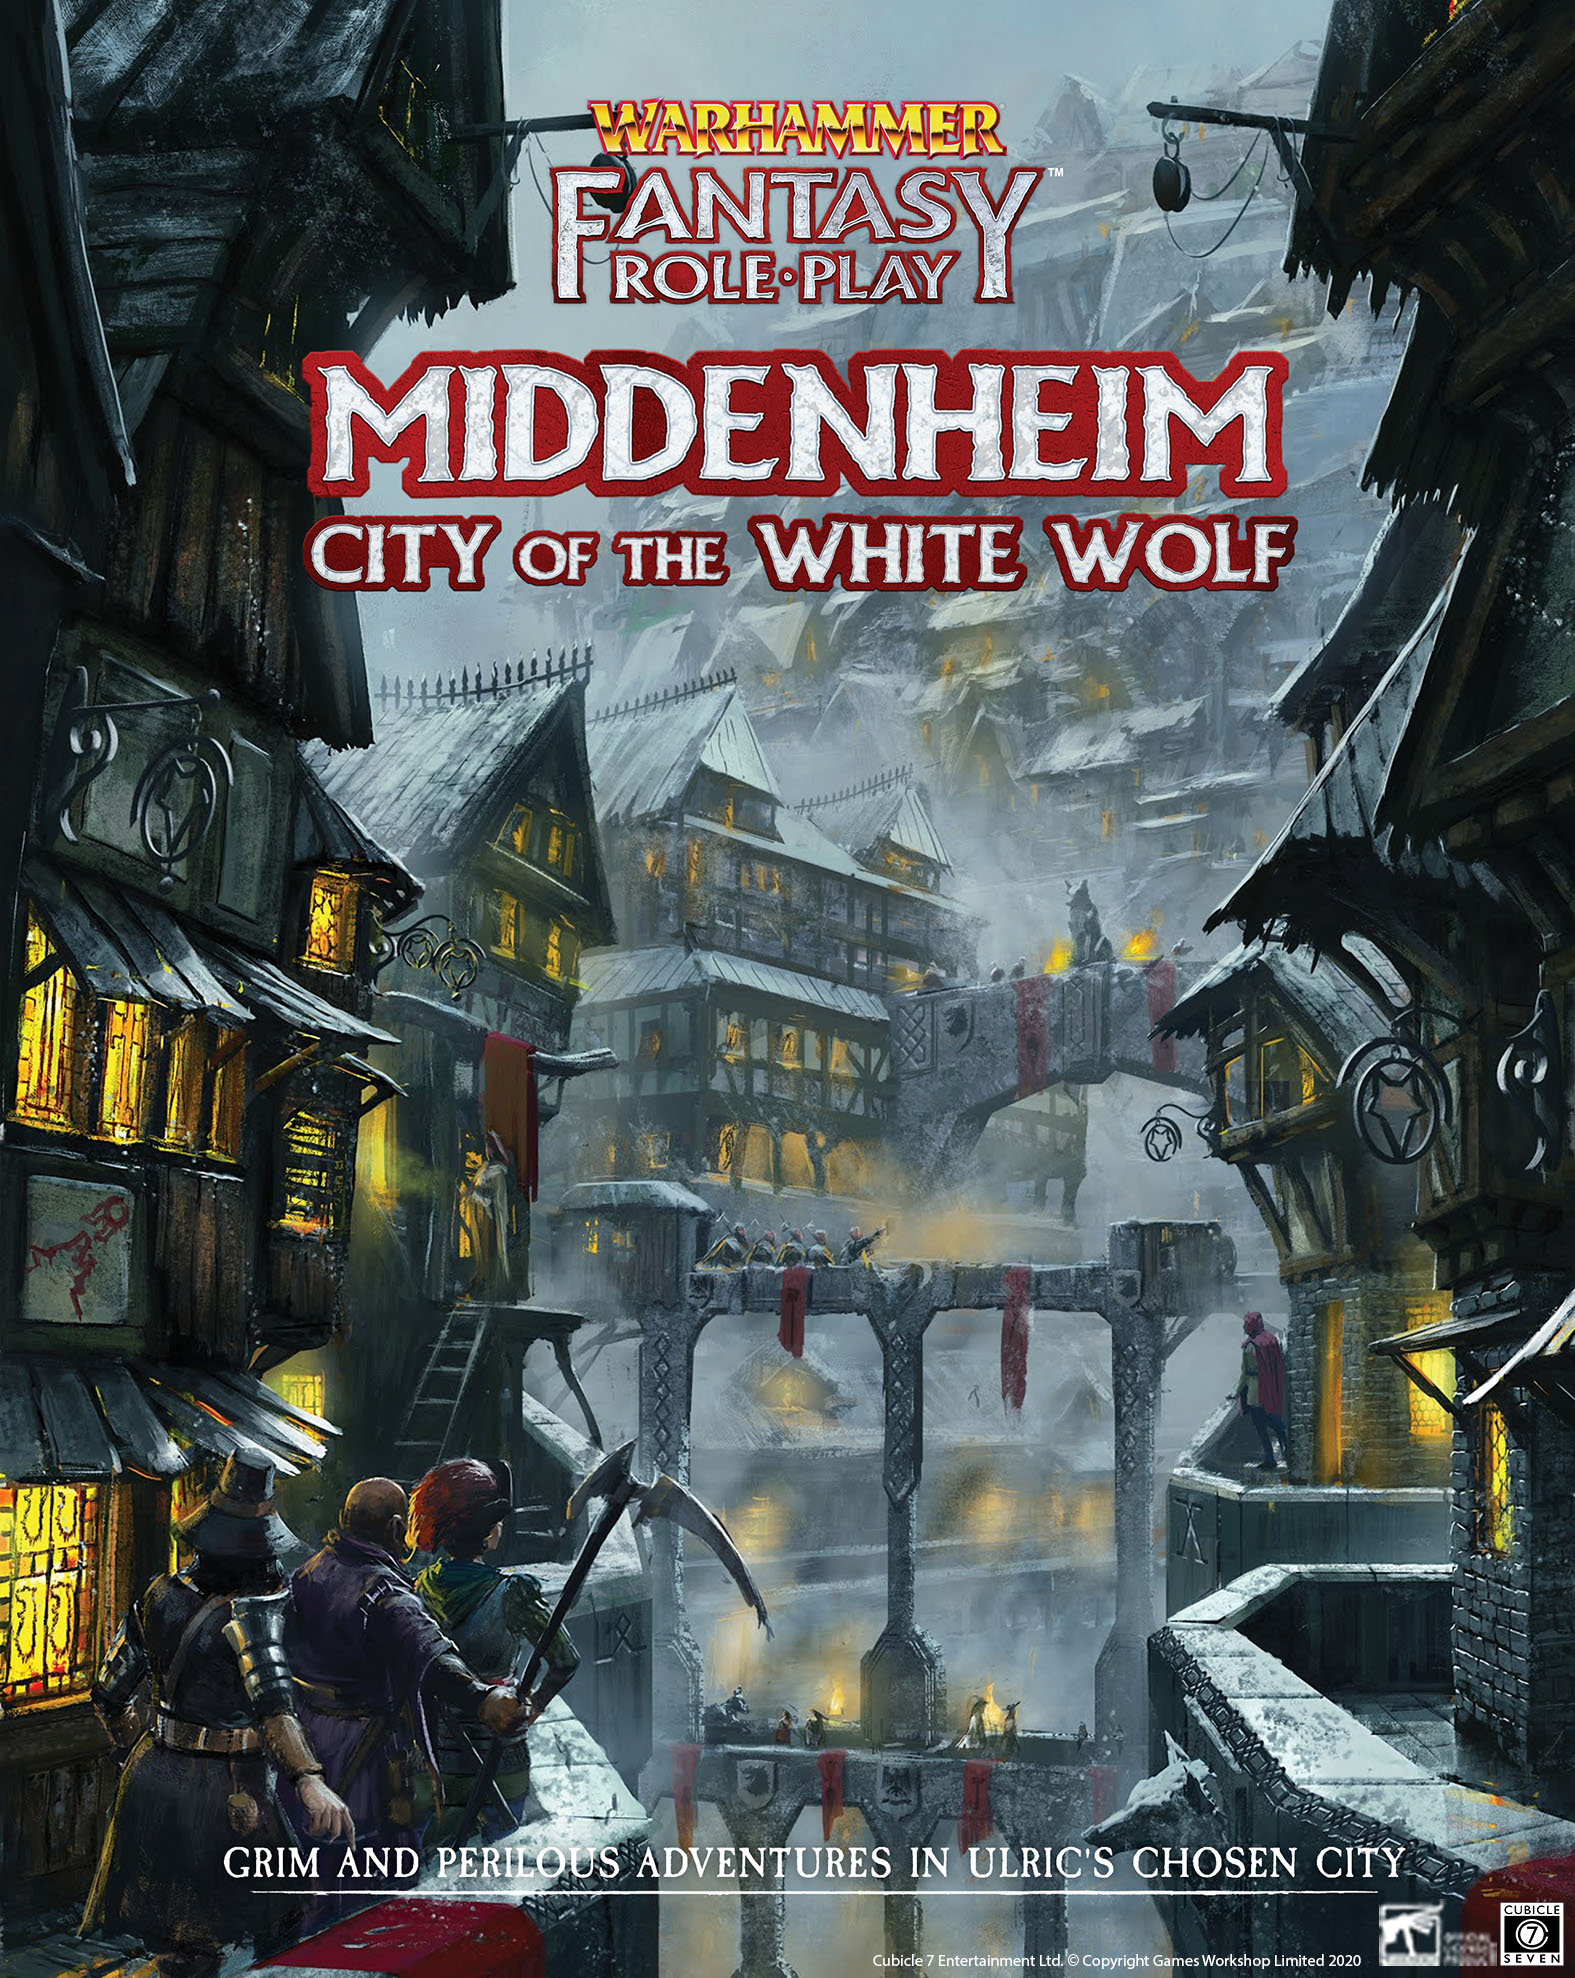 WARHAMMER FANTASY ROLE PLAY -  MIDDENHEIM CITY OF THE WHITE WOLF HC (ENGLISH)